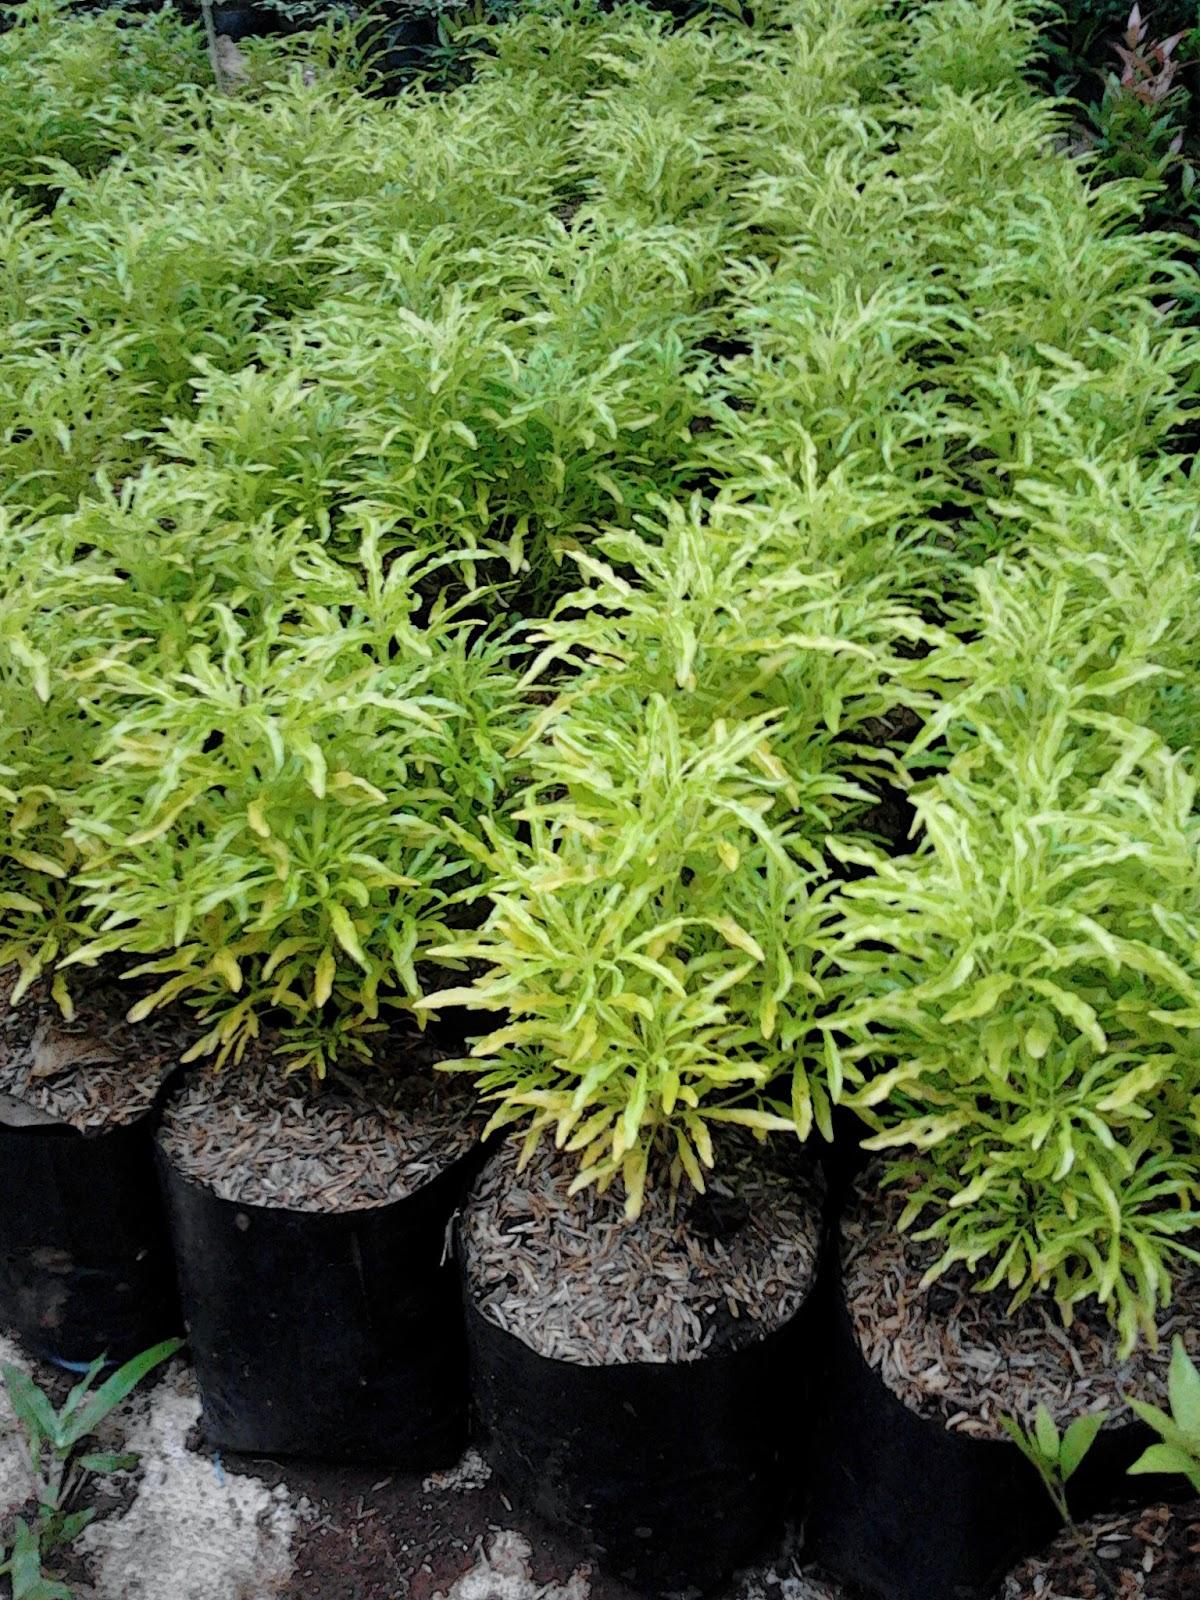 Jual pohon Brokoli Hias | tanaman hias | jasa tukang taman